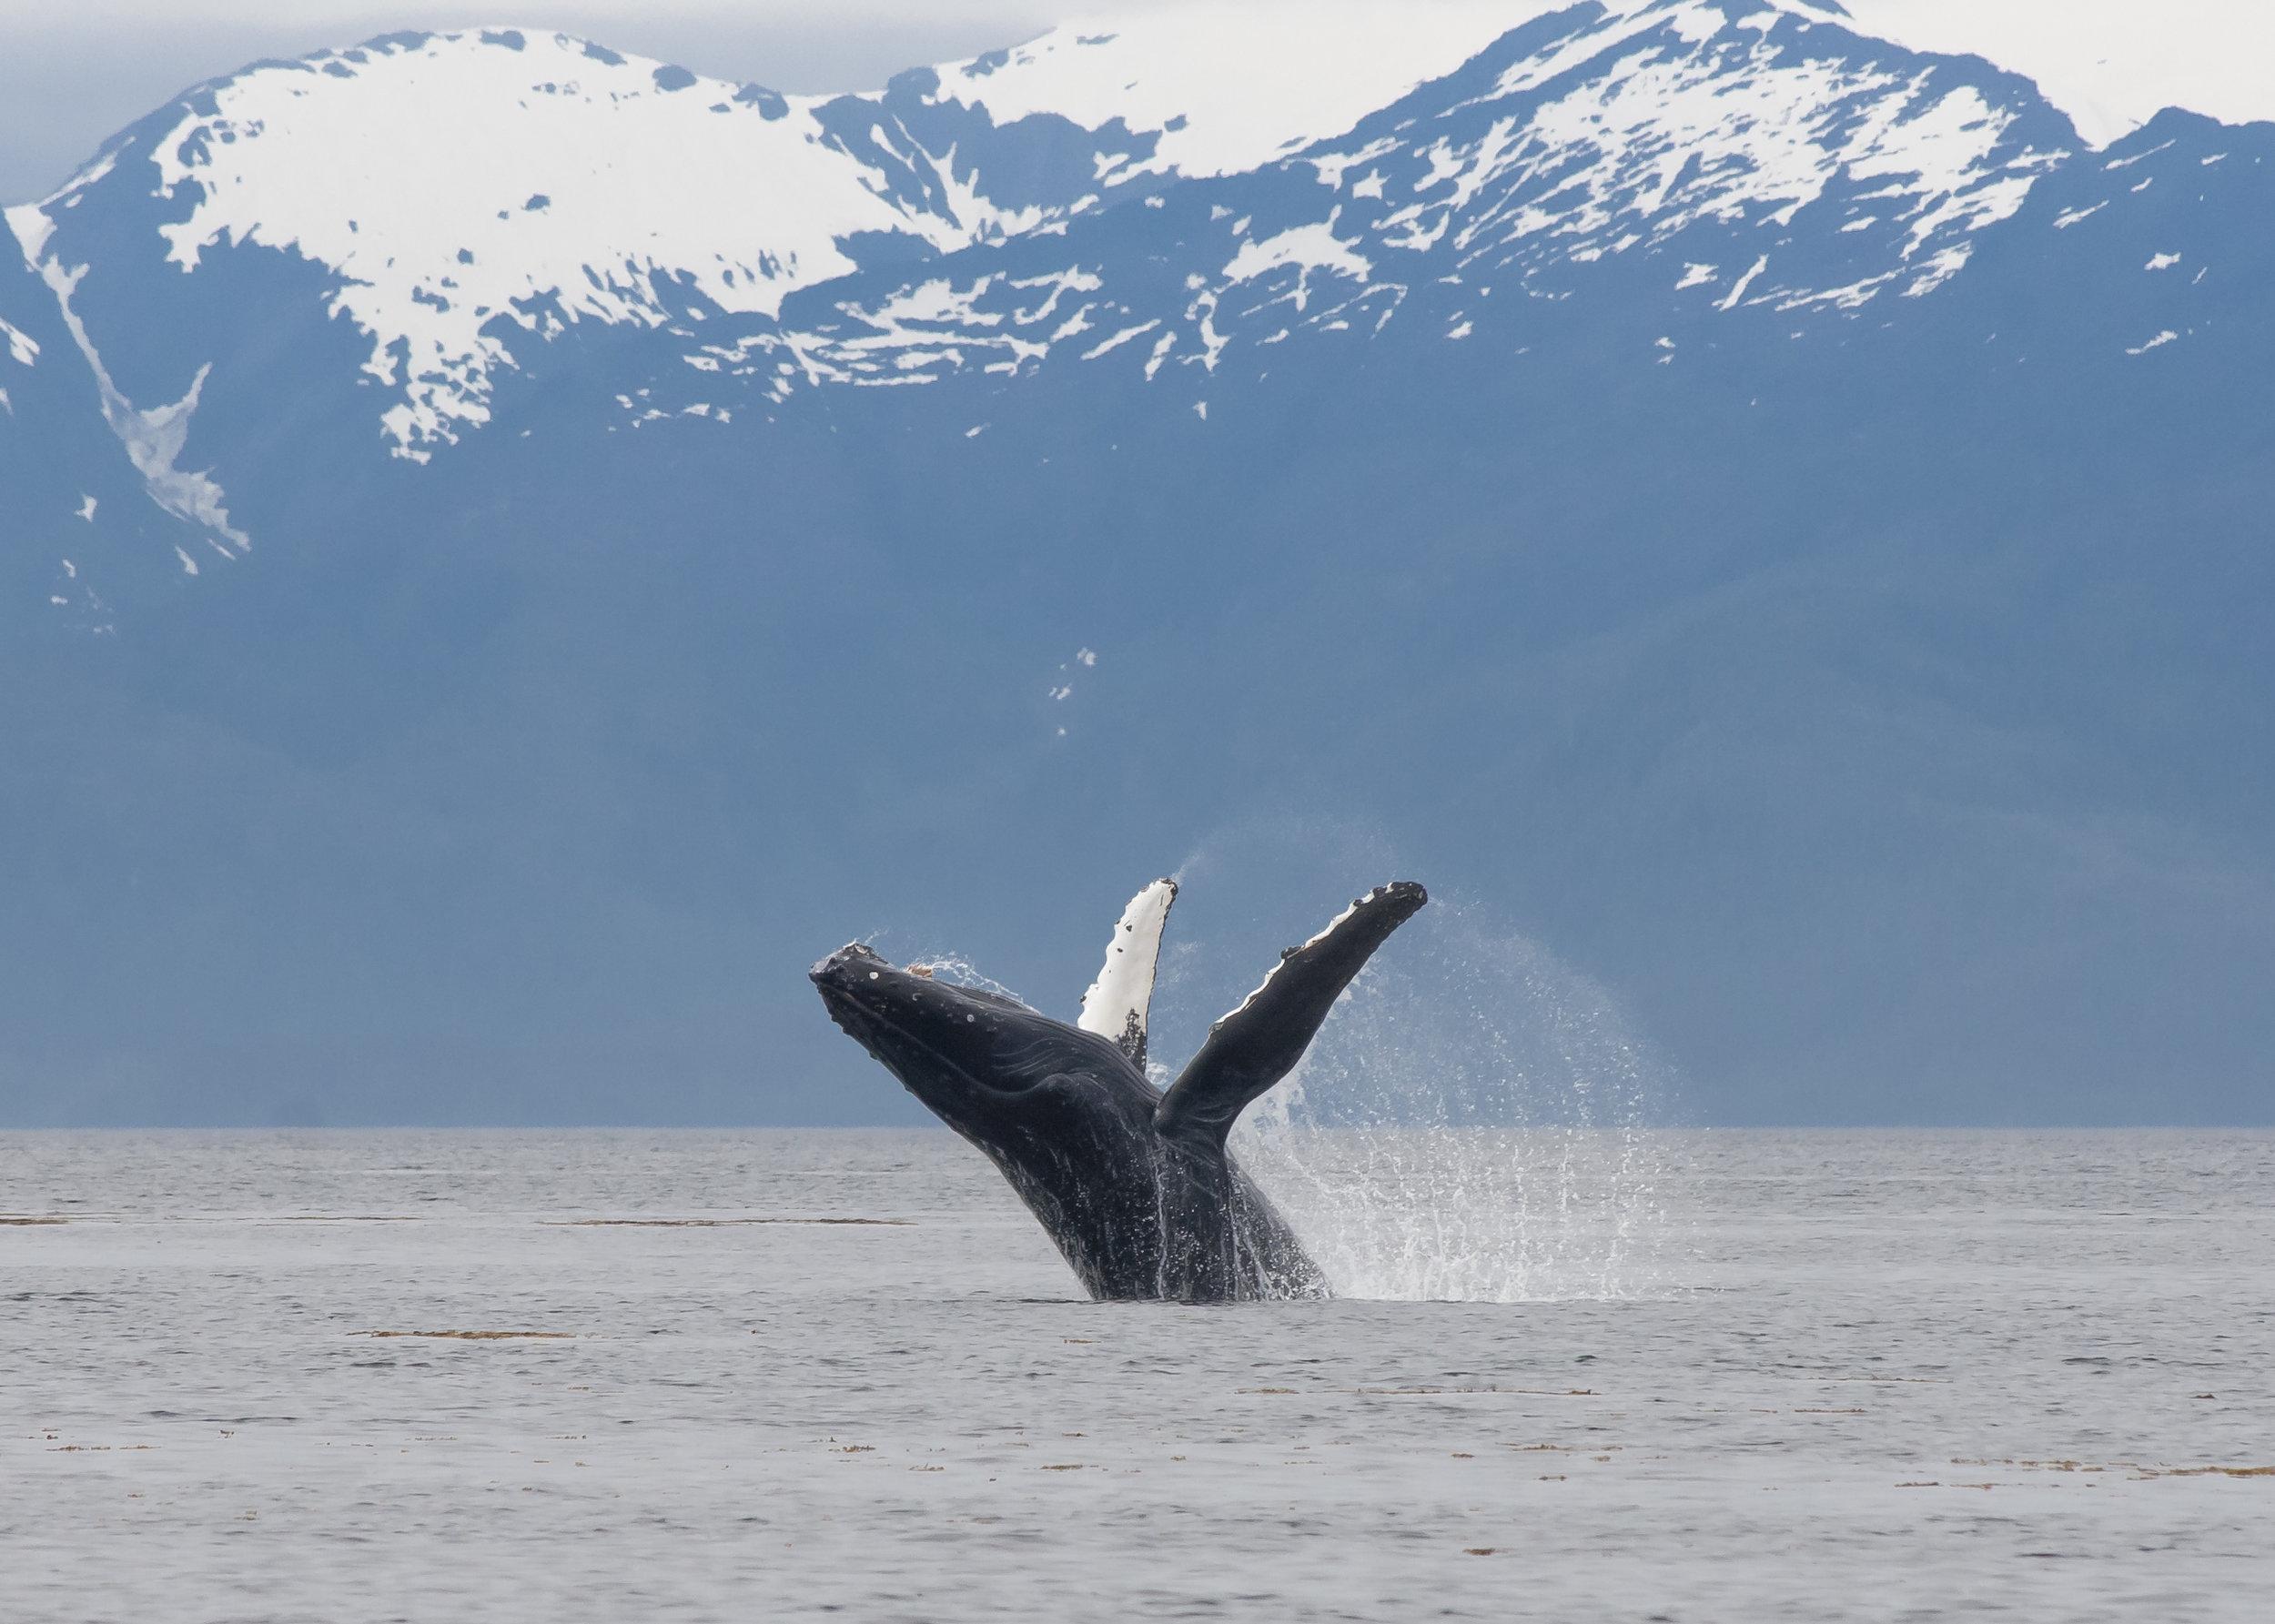 2010-07-18 humpback breaching 05-01.jpg